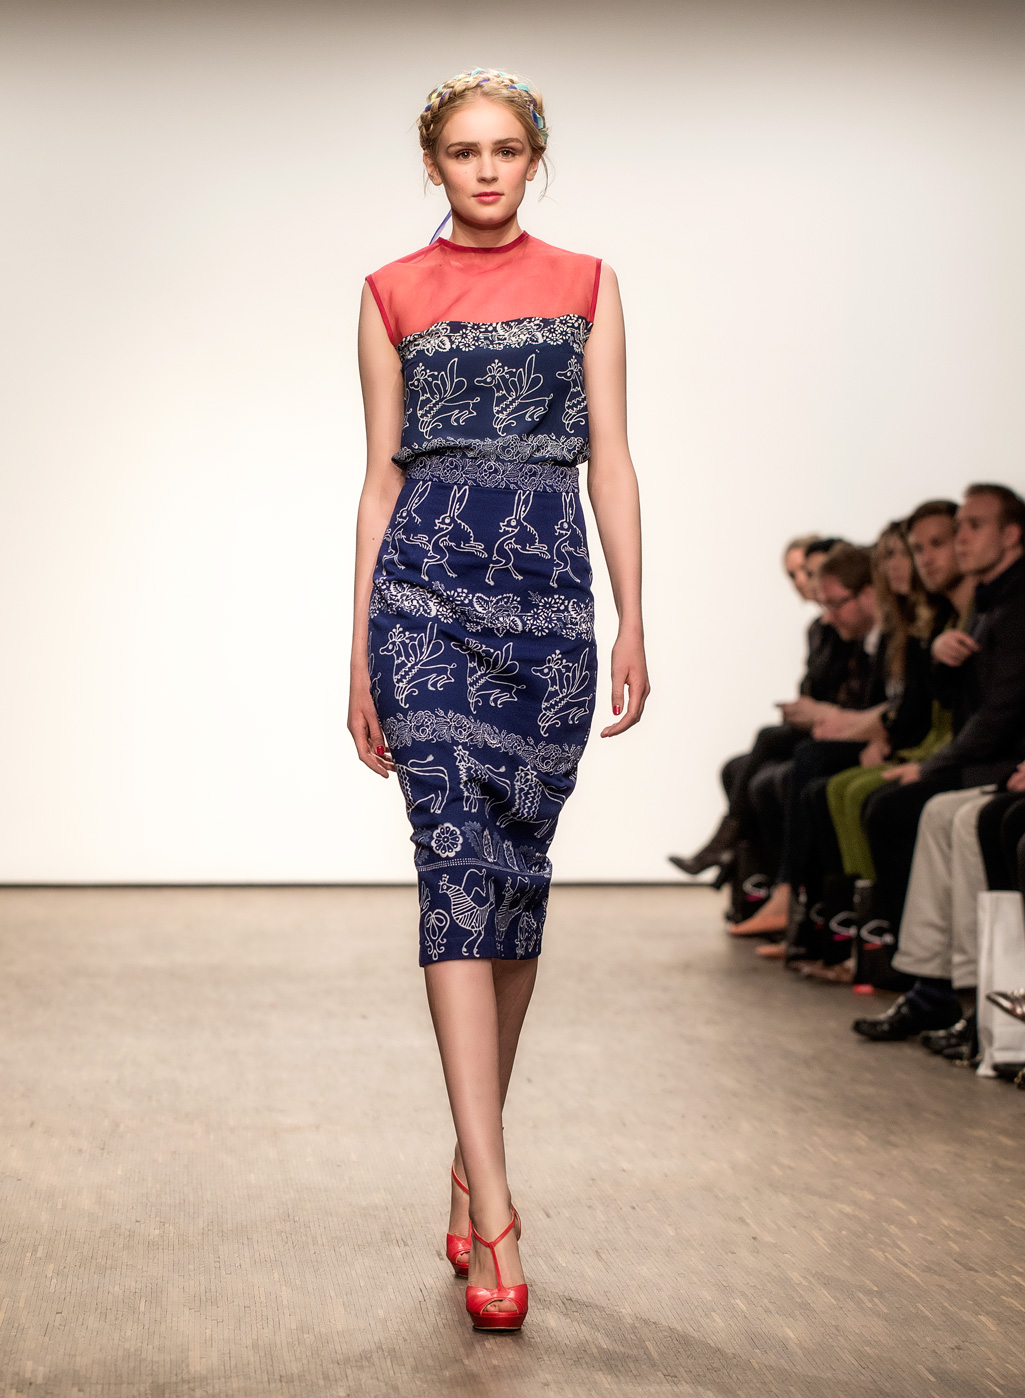 berlin-fashionweek piroshka